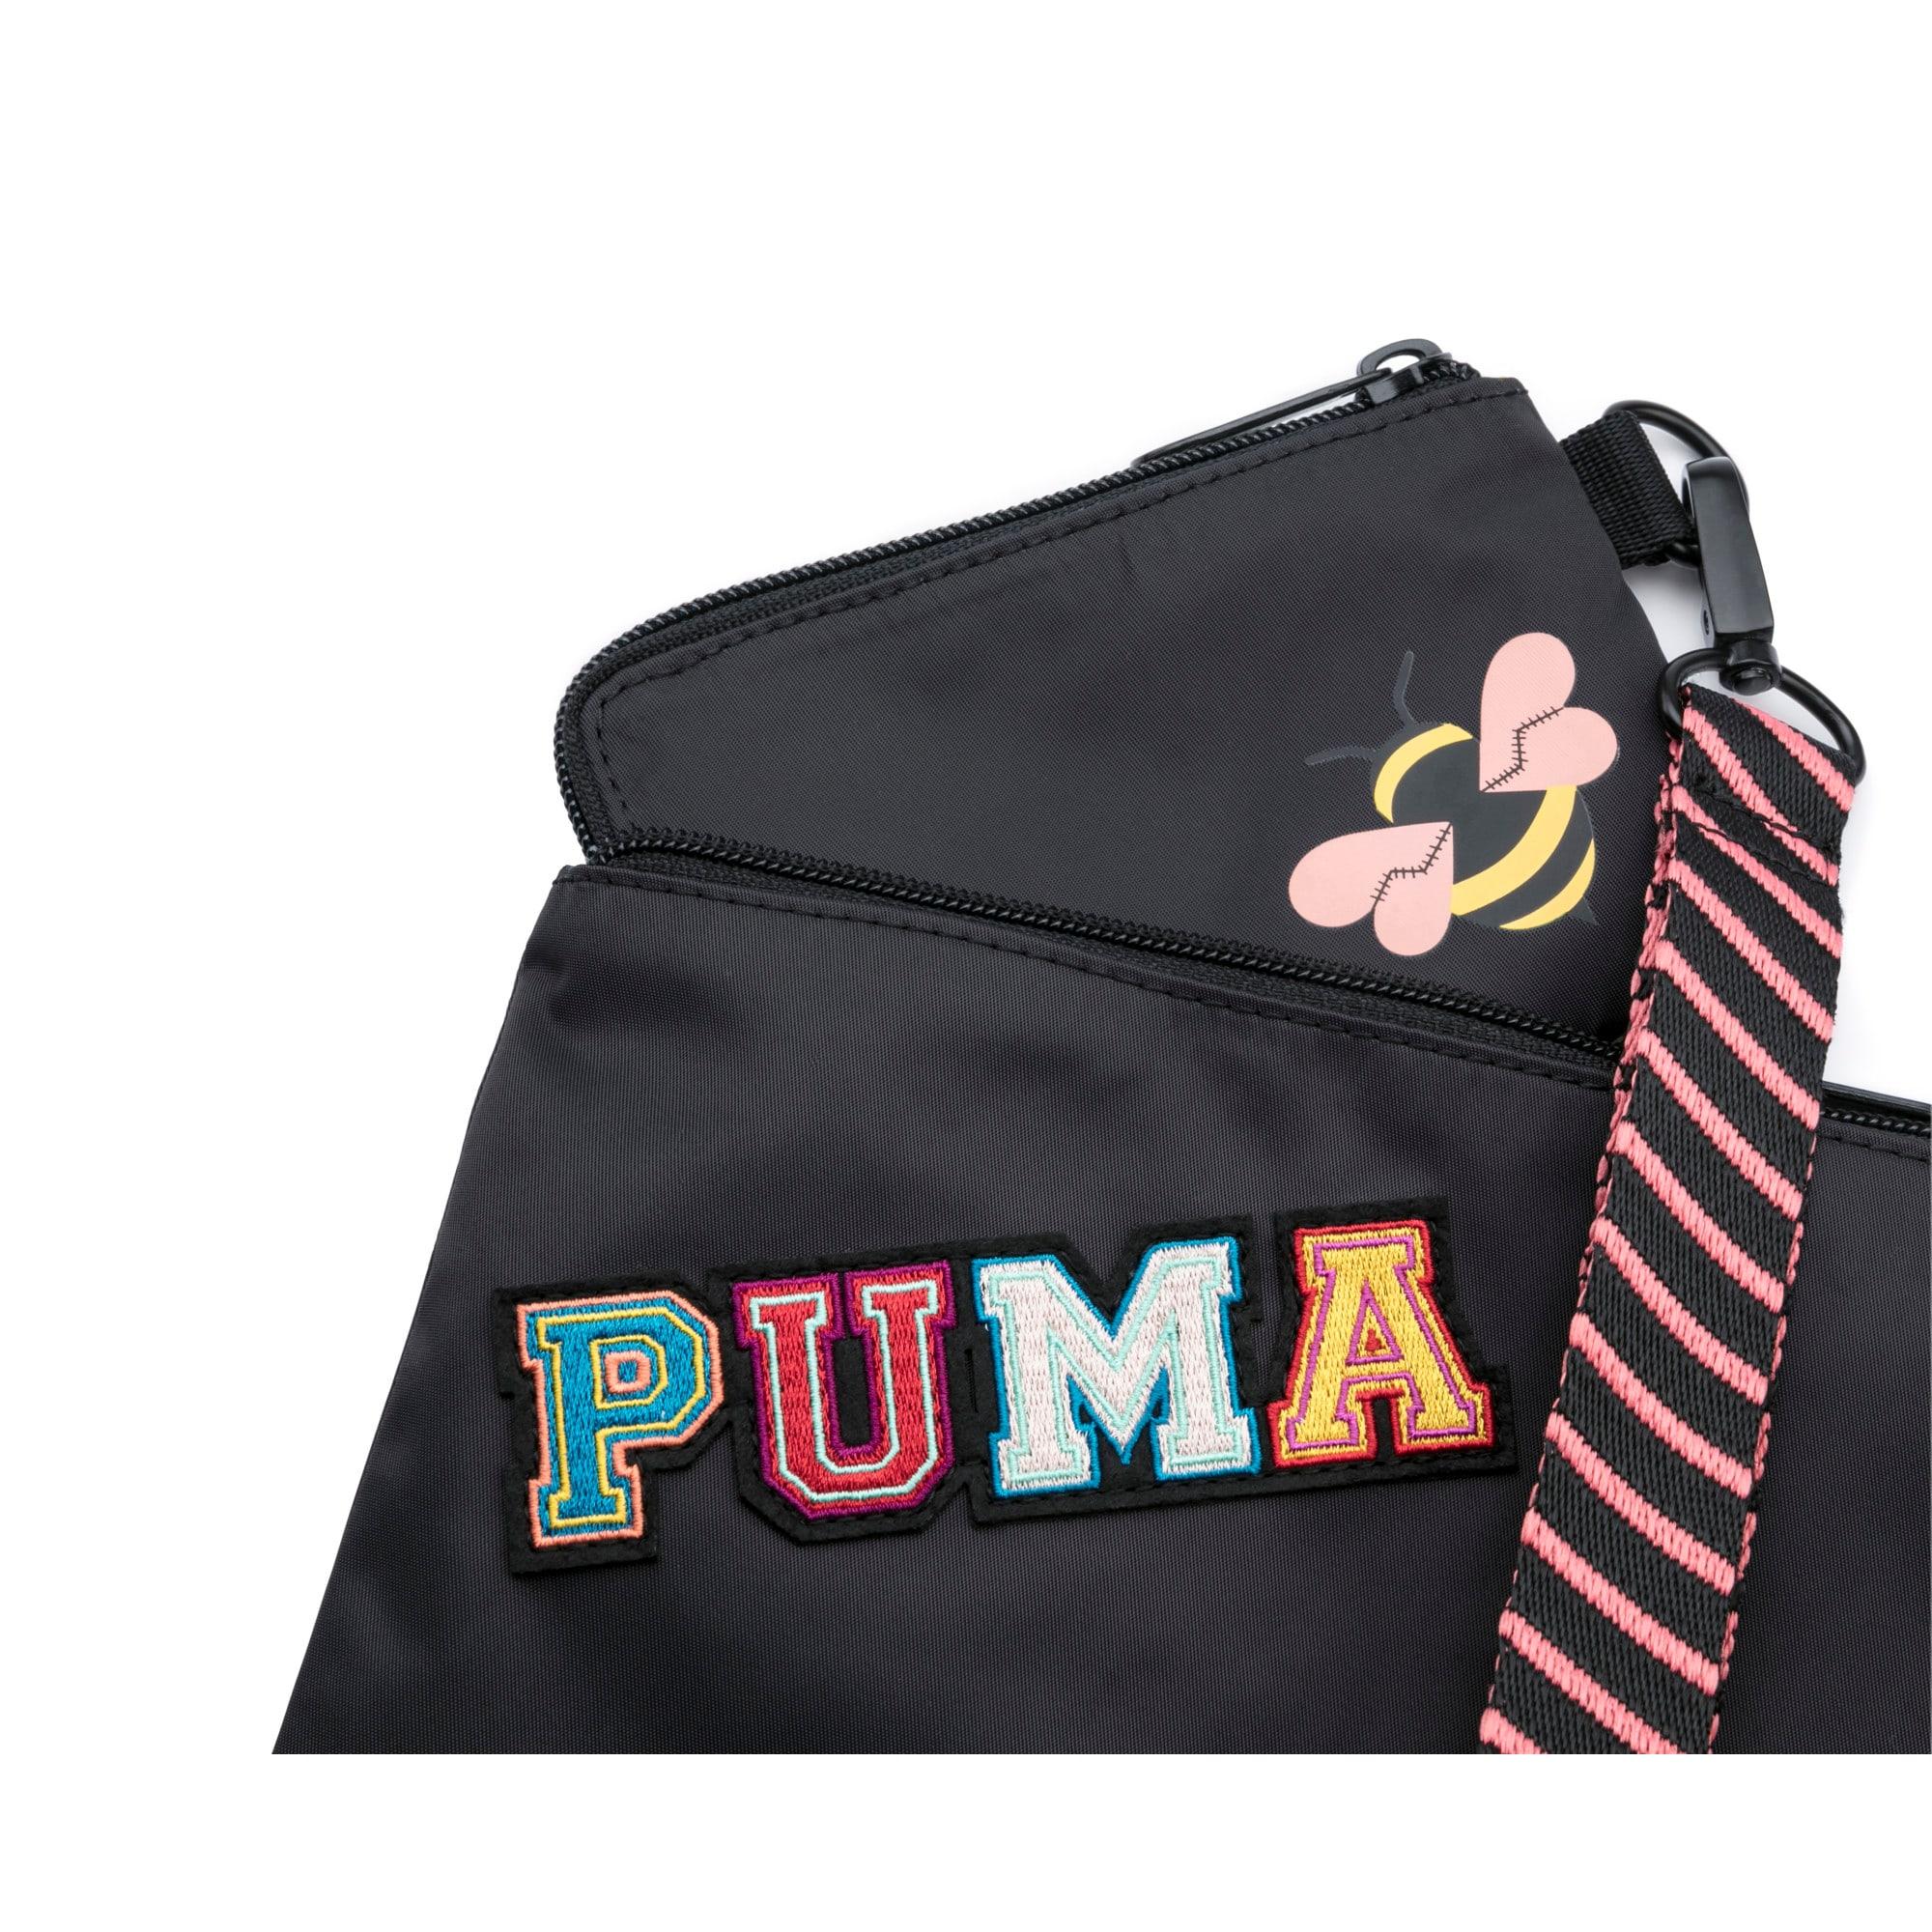 Thumbnail 5 of PUMA x Sue Tsai damesbuideltasje, Puma Black, medium